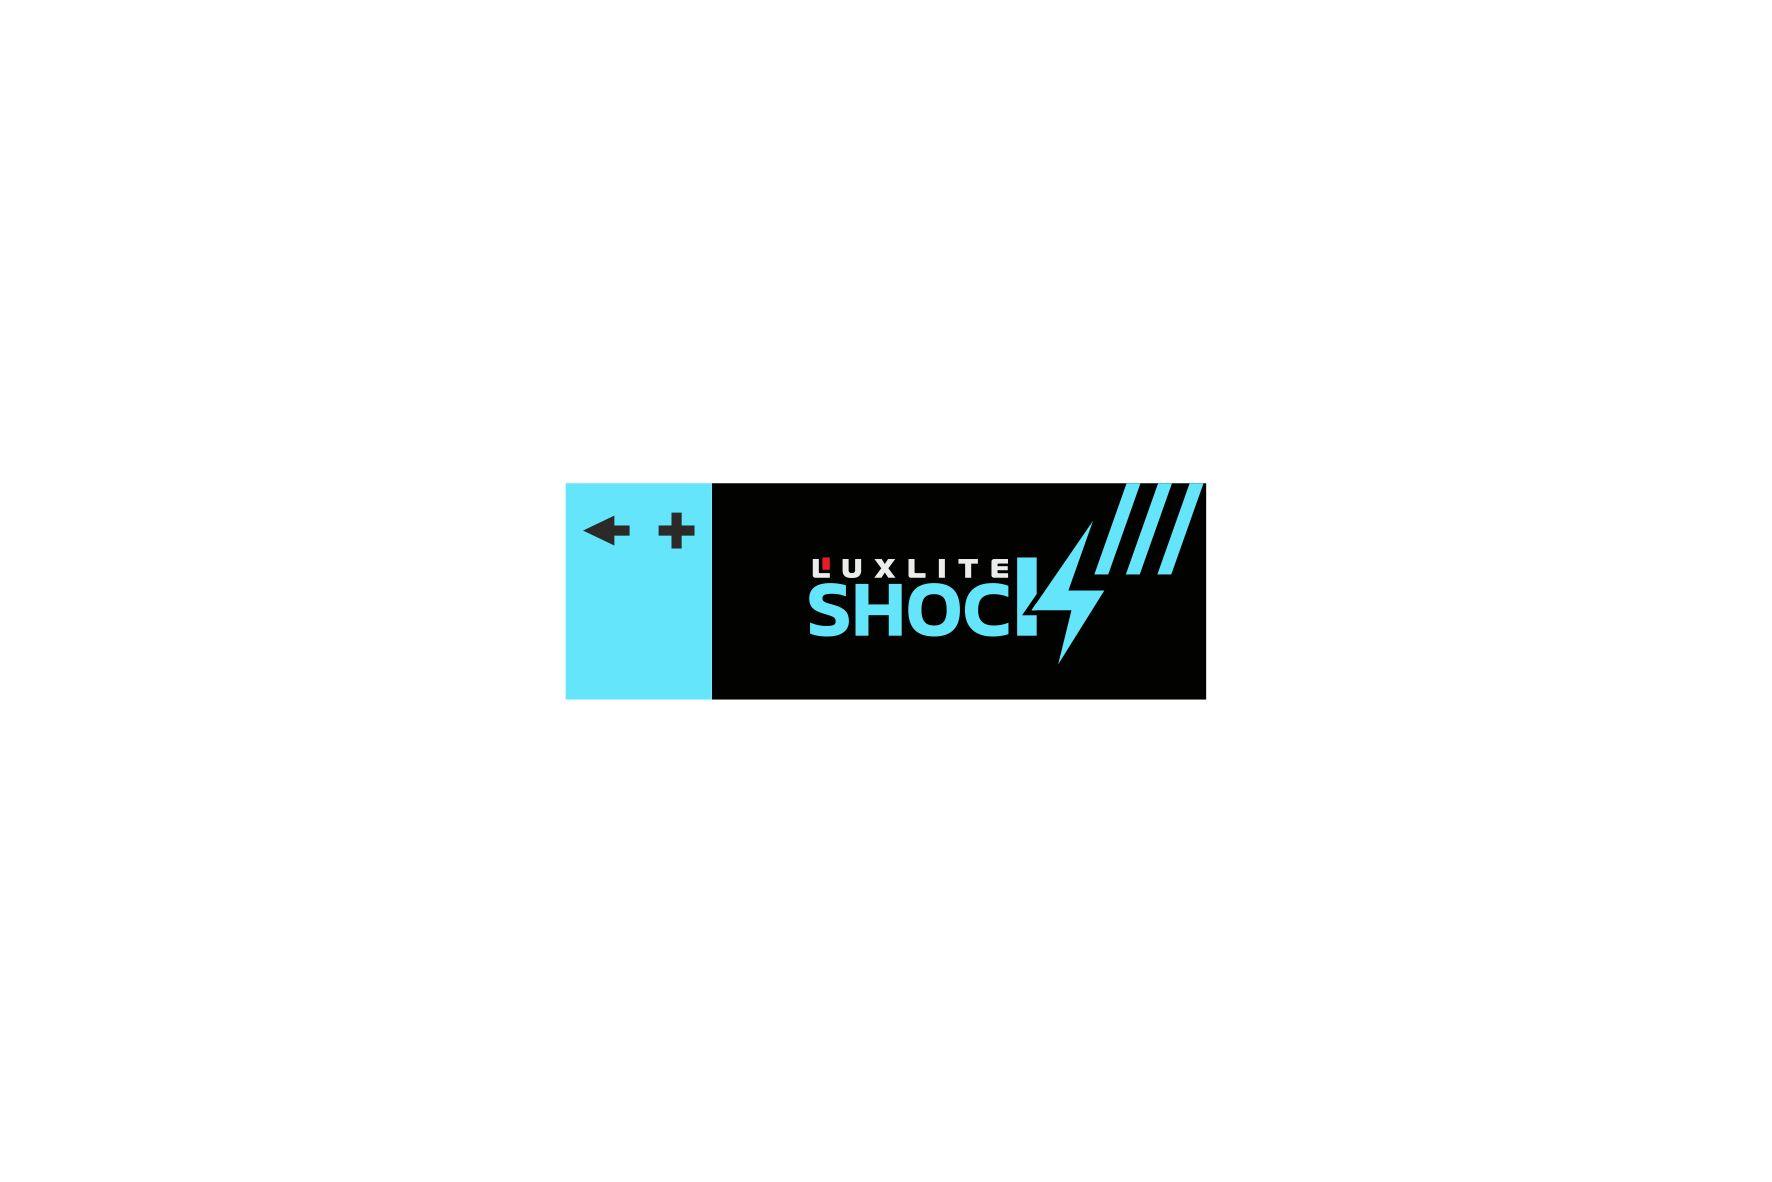 Логотип для батареек LUXLITE SHOCK - дизайнер erkin84m